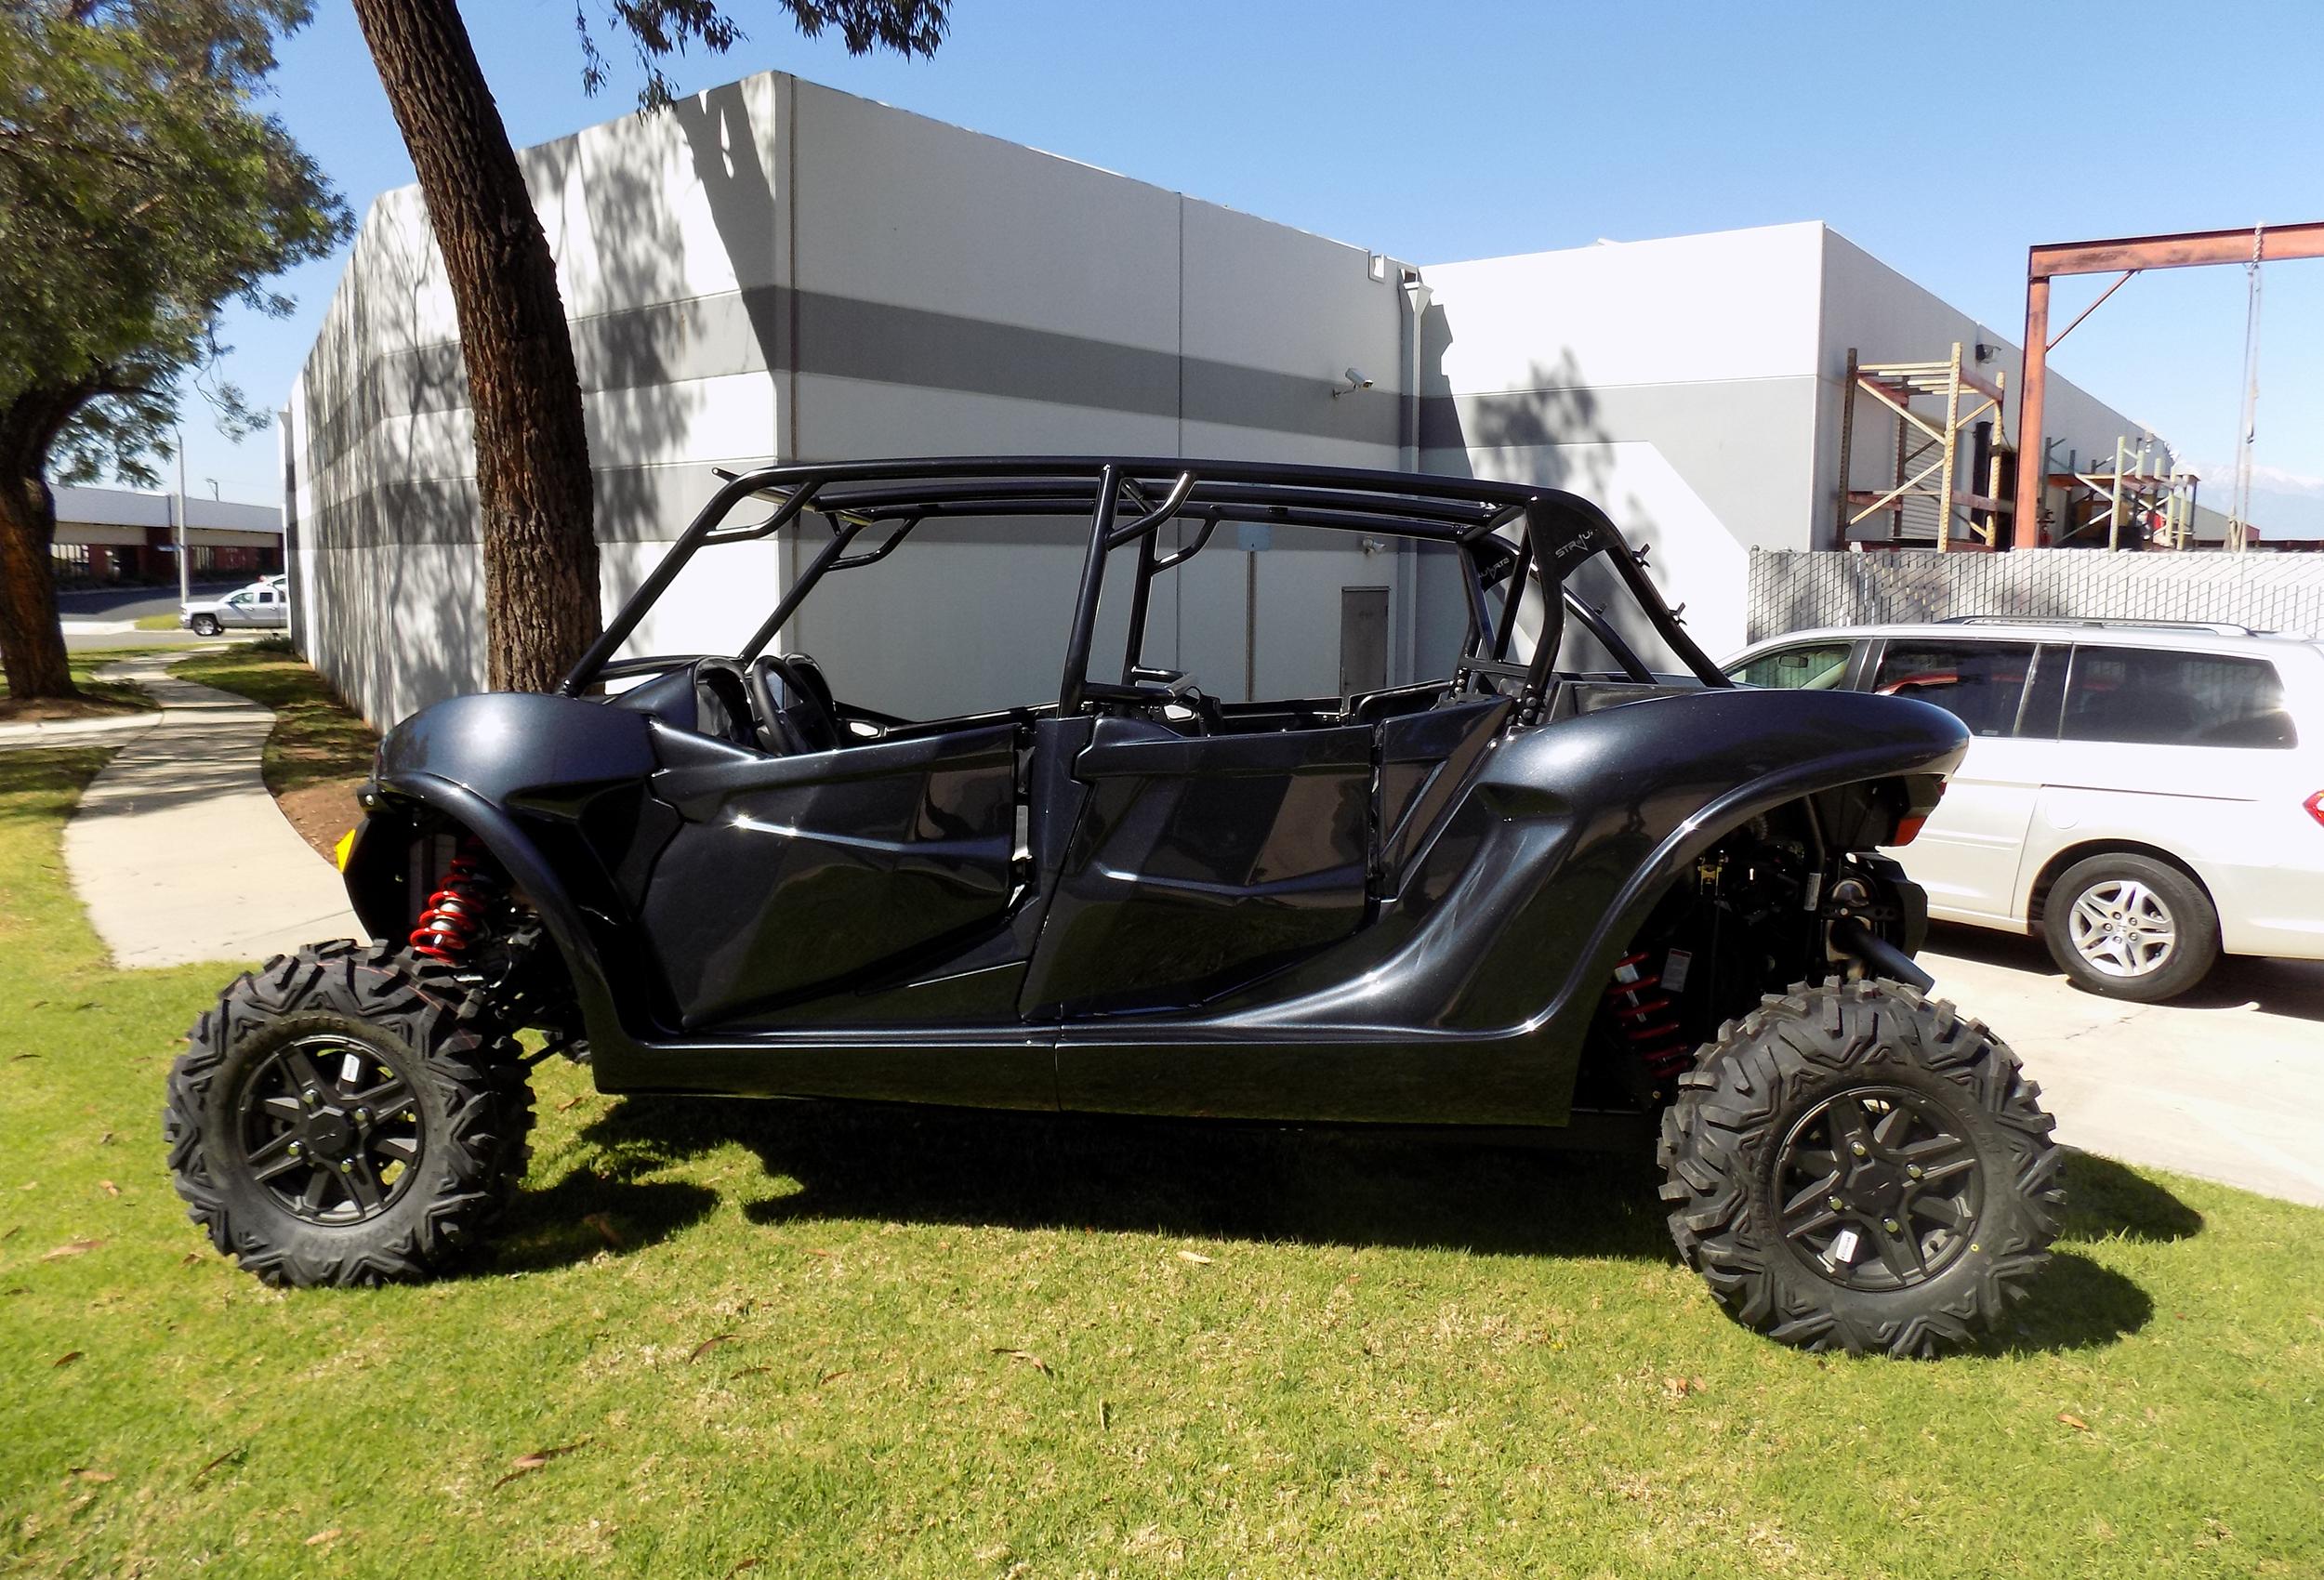 Polaris RZR XP1000 fiberglass body kit by Lavey Craft - black.jpg